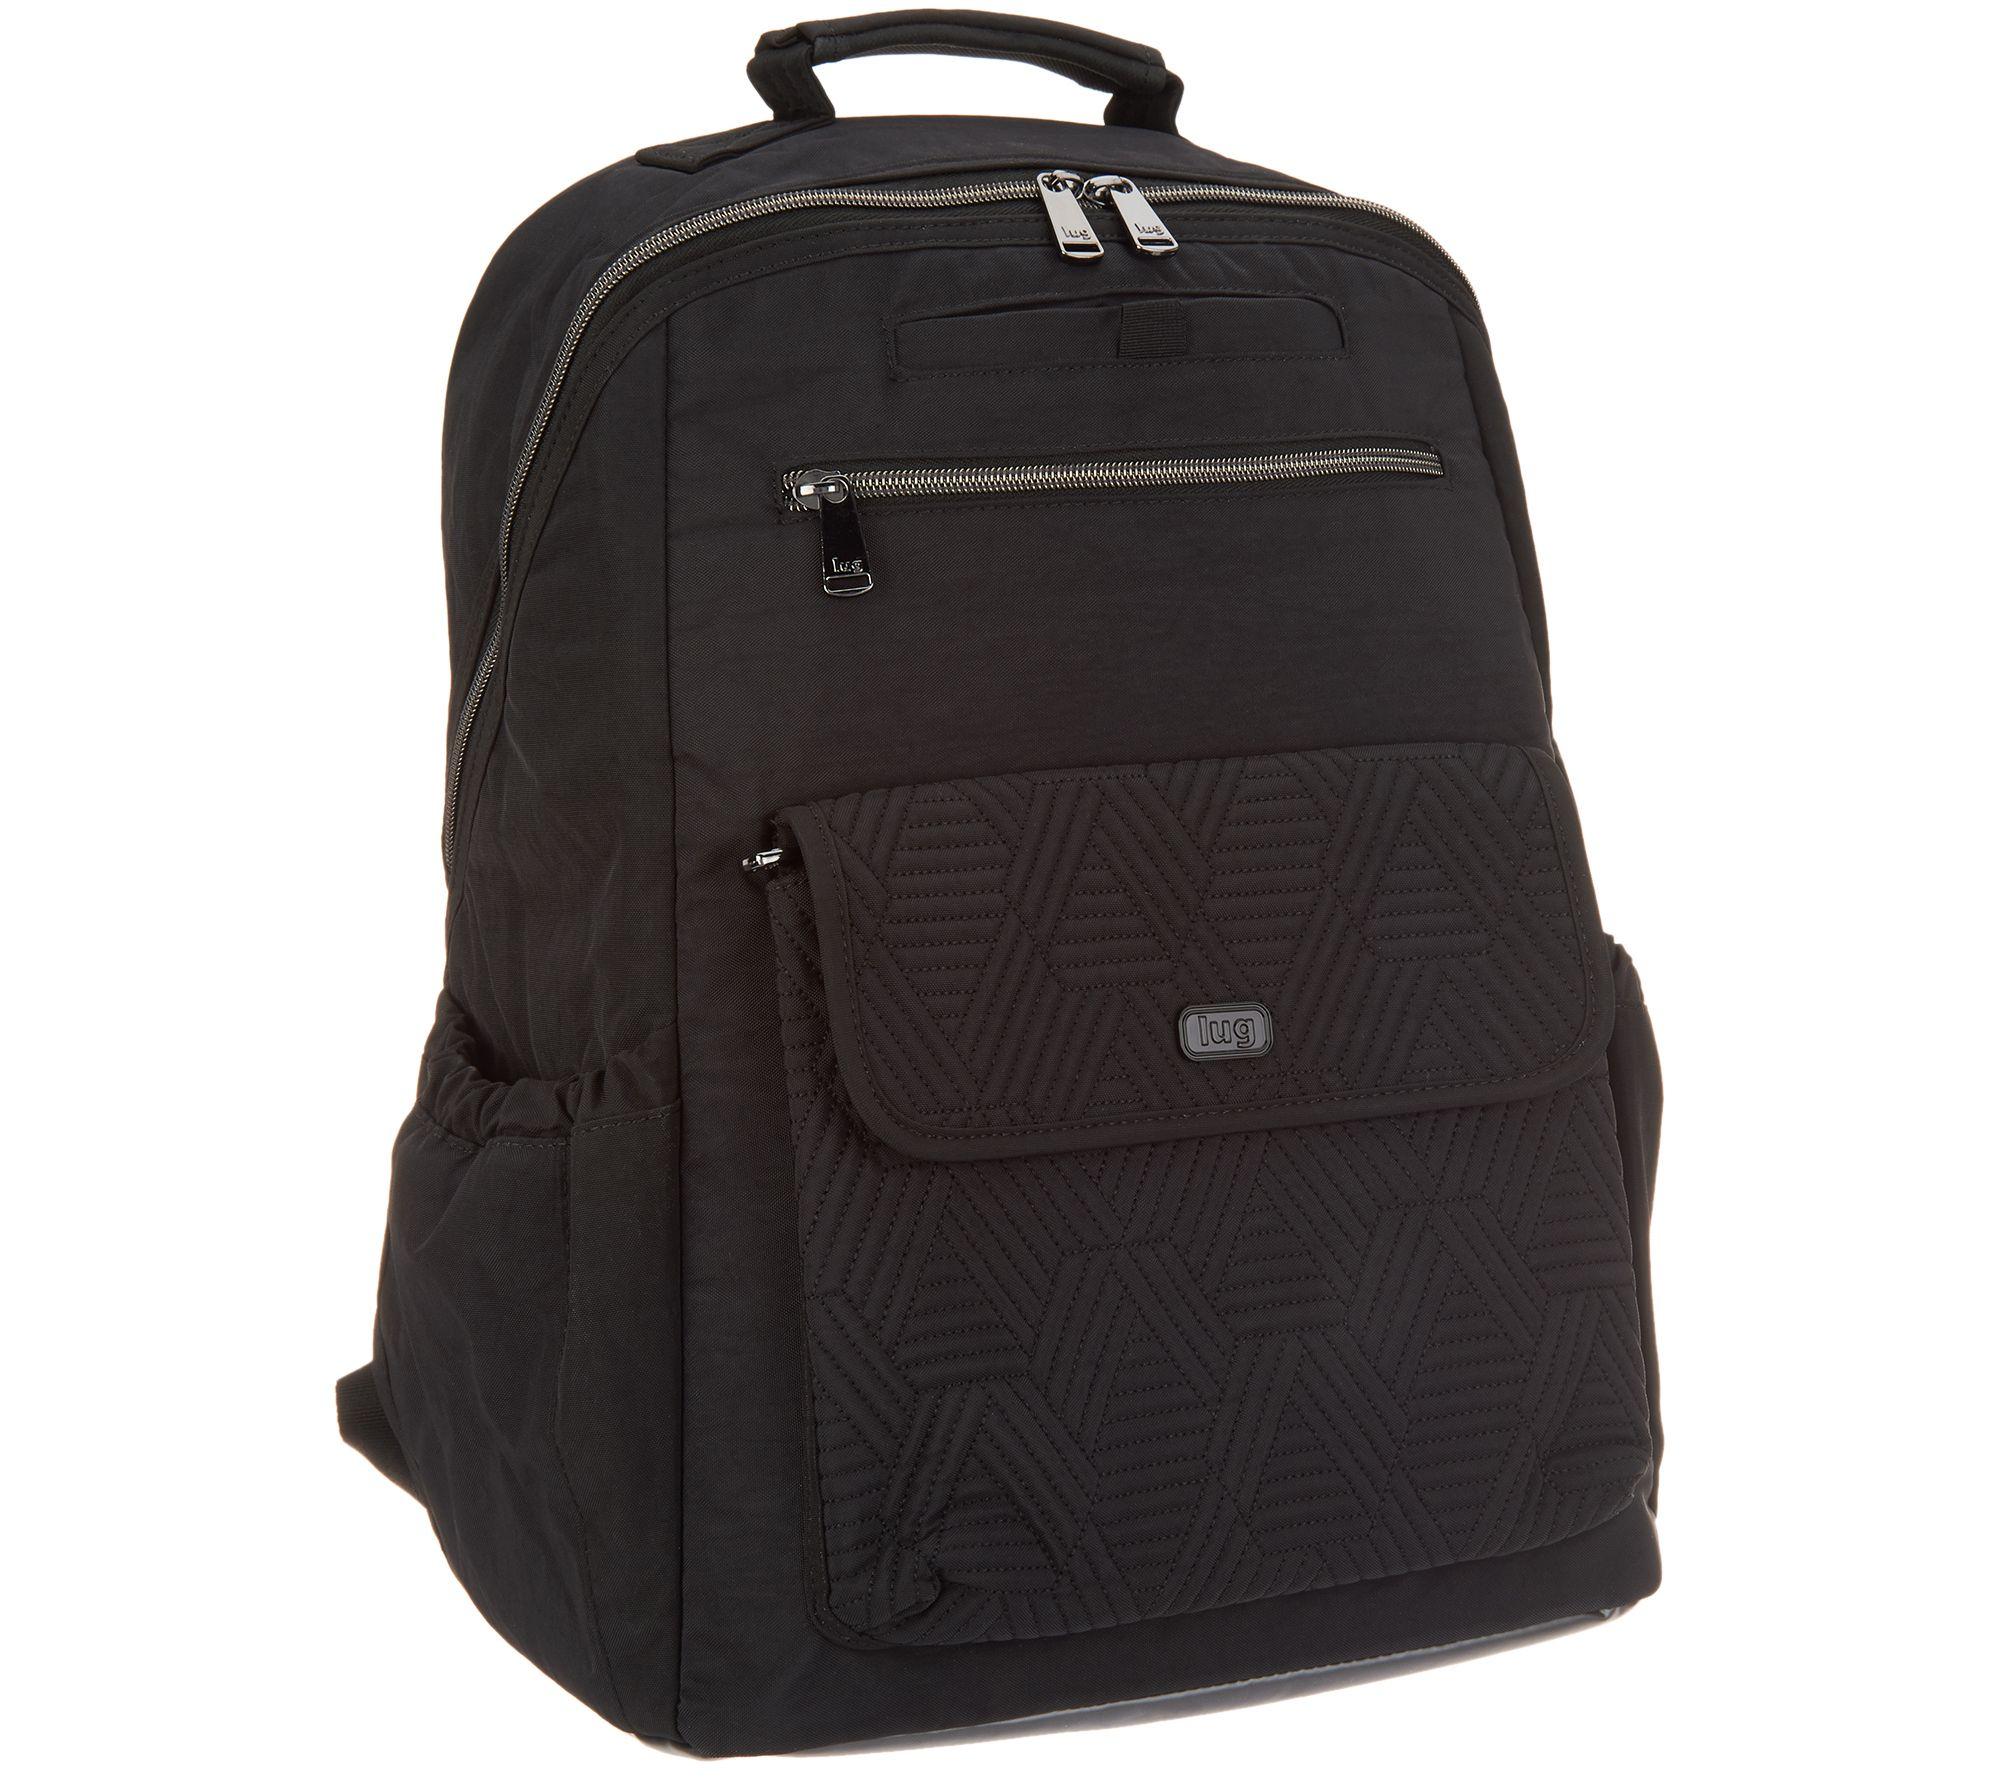 16f17c5fd0 Lug Medium Backpack with RFID - Tumbler - Page 1 — QVC.com